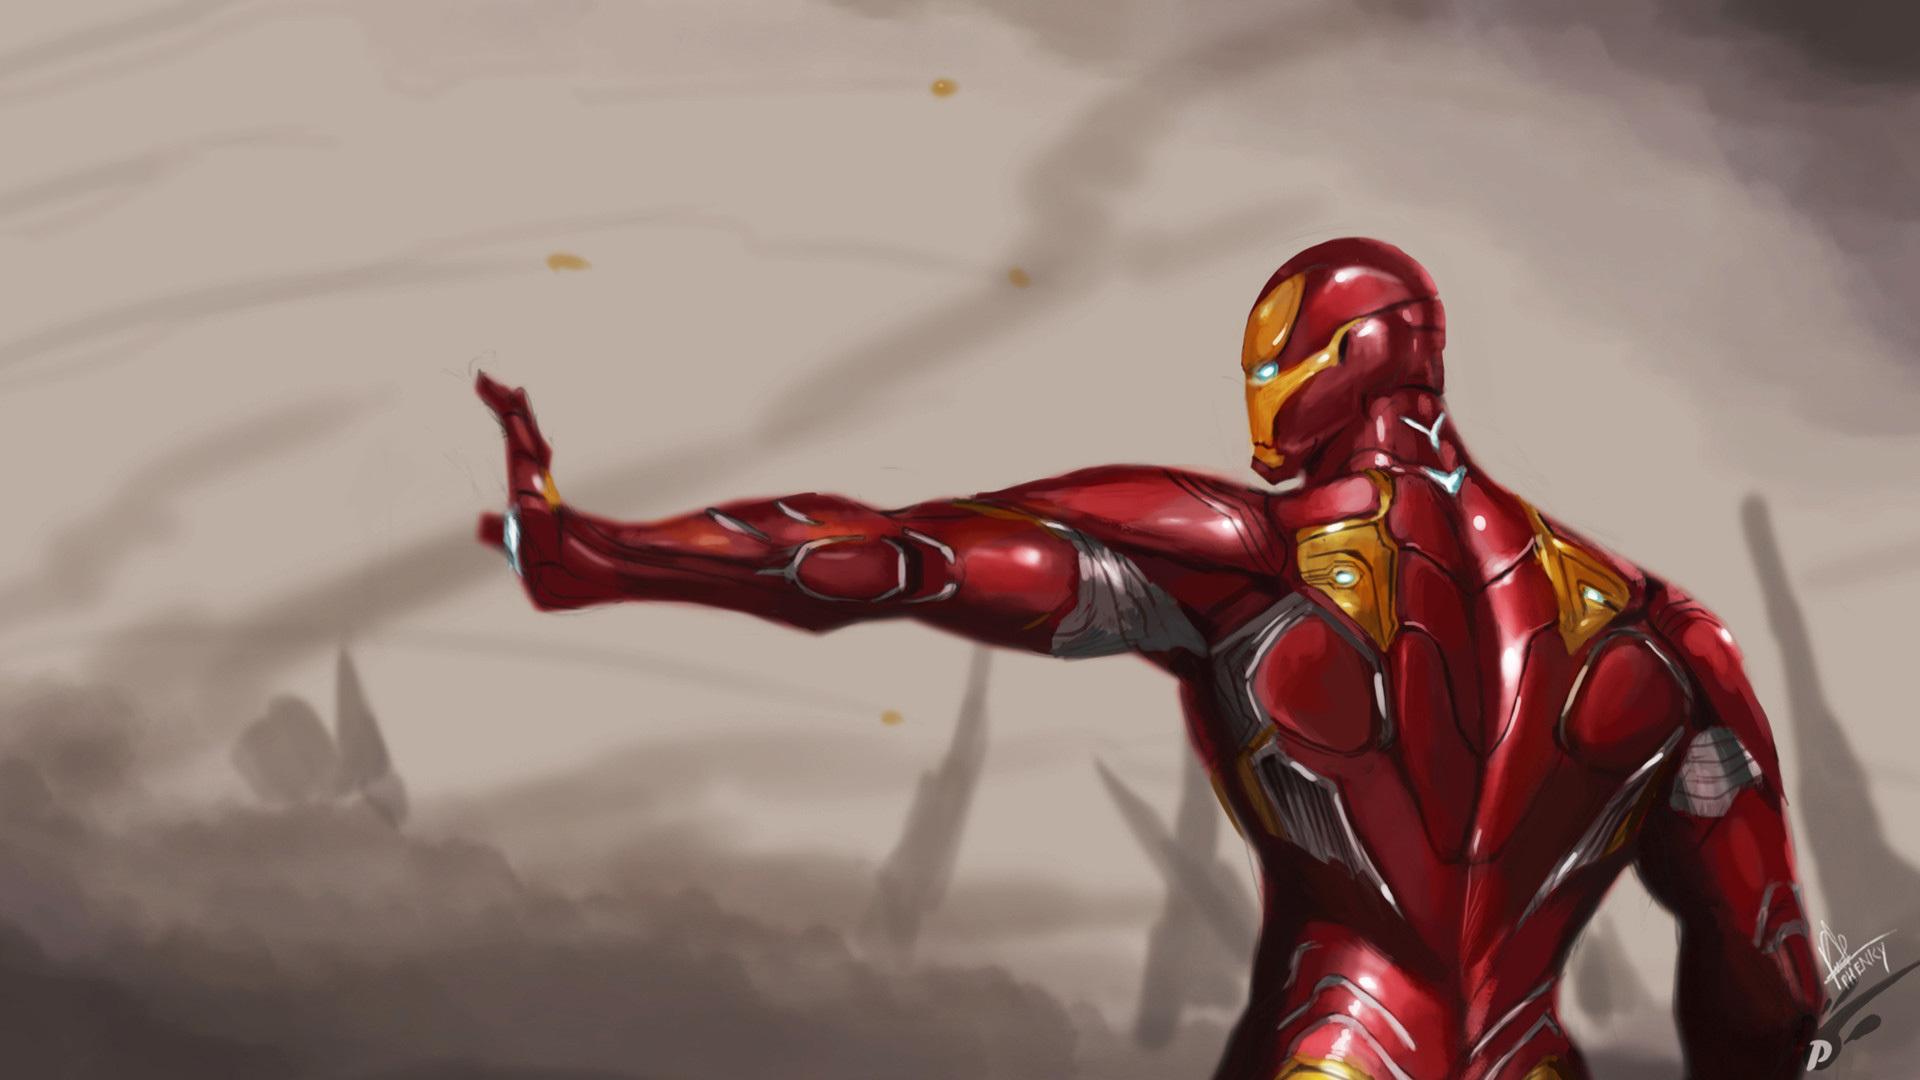 1920x1080 Iron Man Mark 50 Suit Avengers Infinity War Laptop